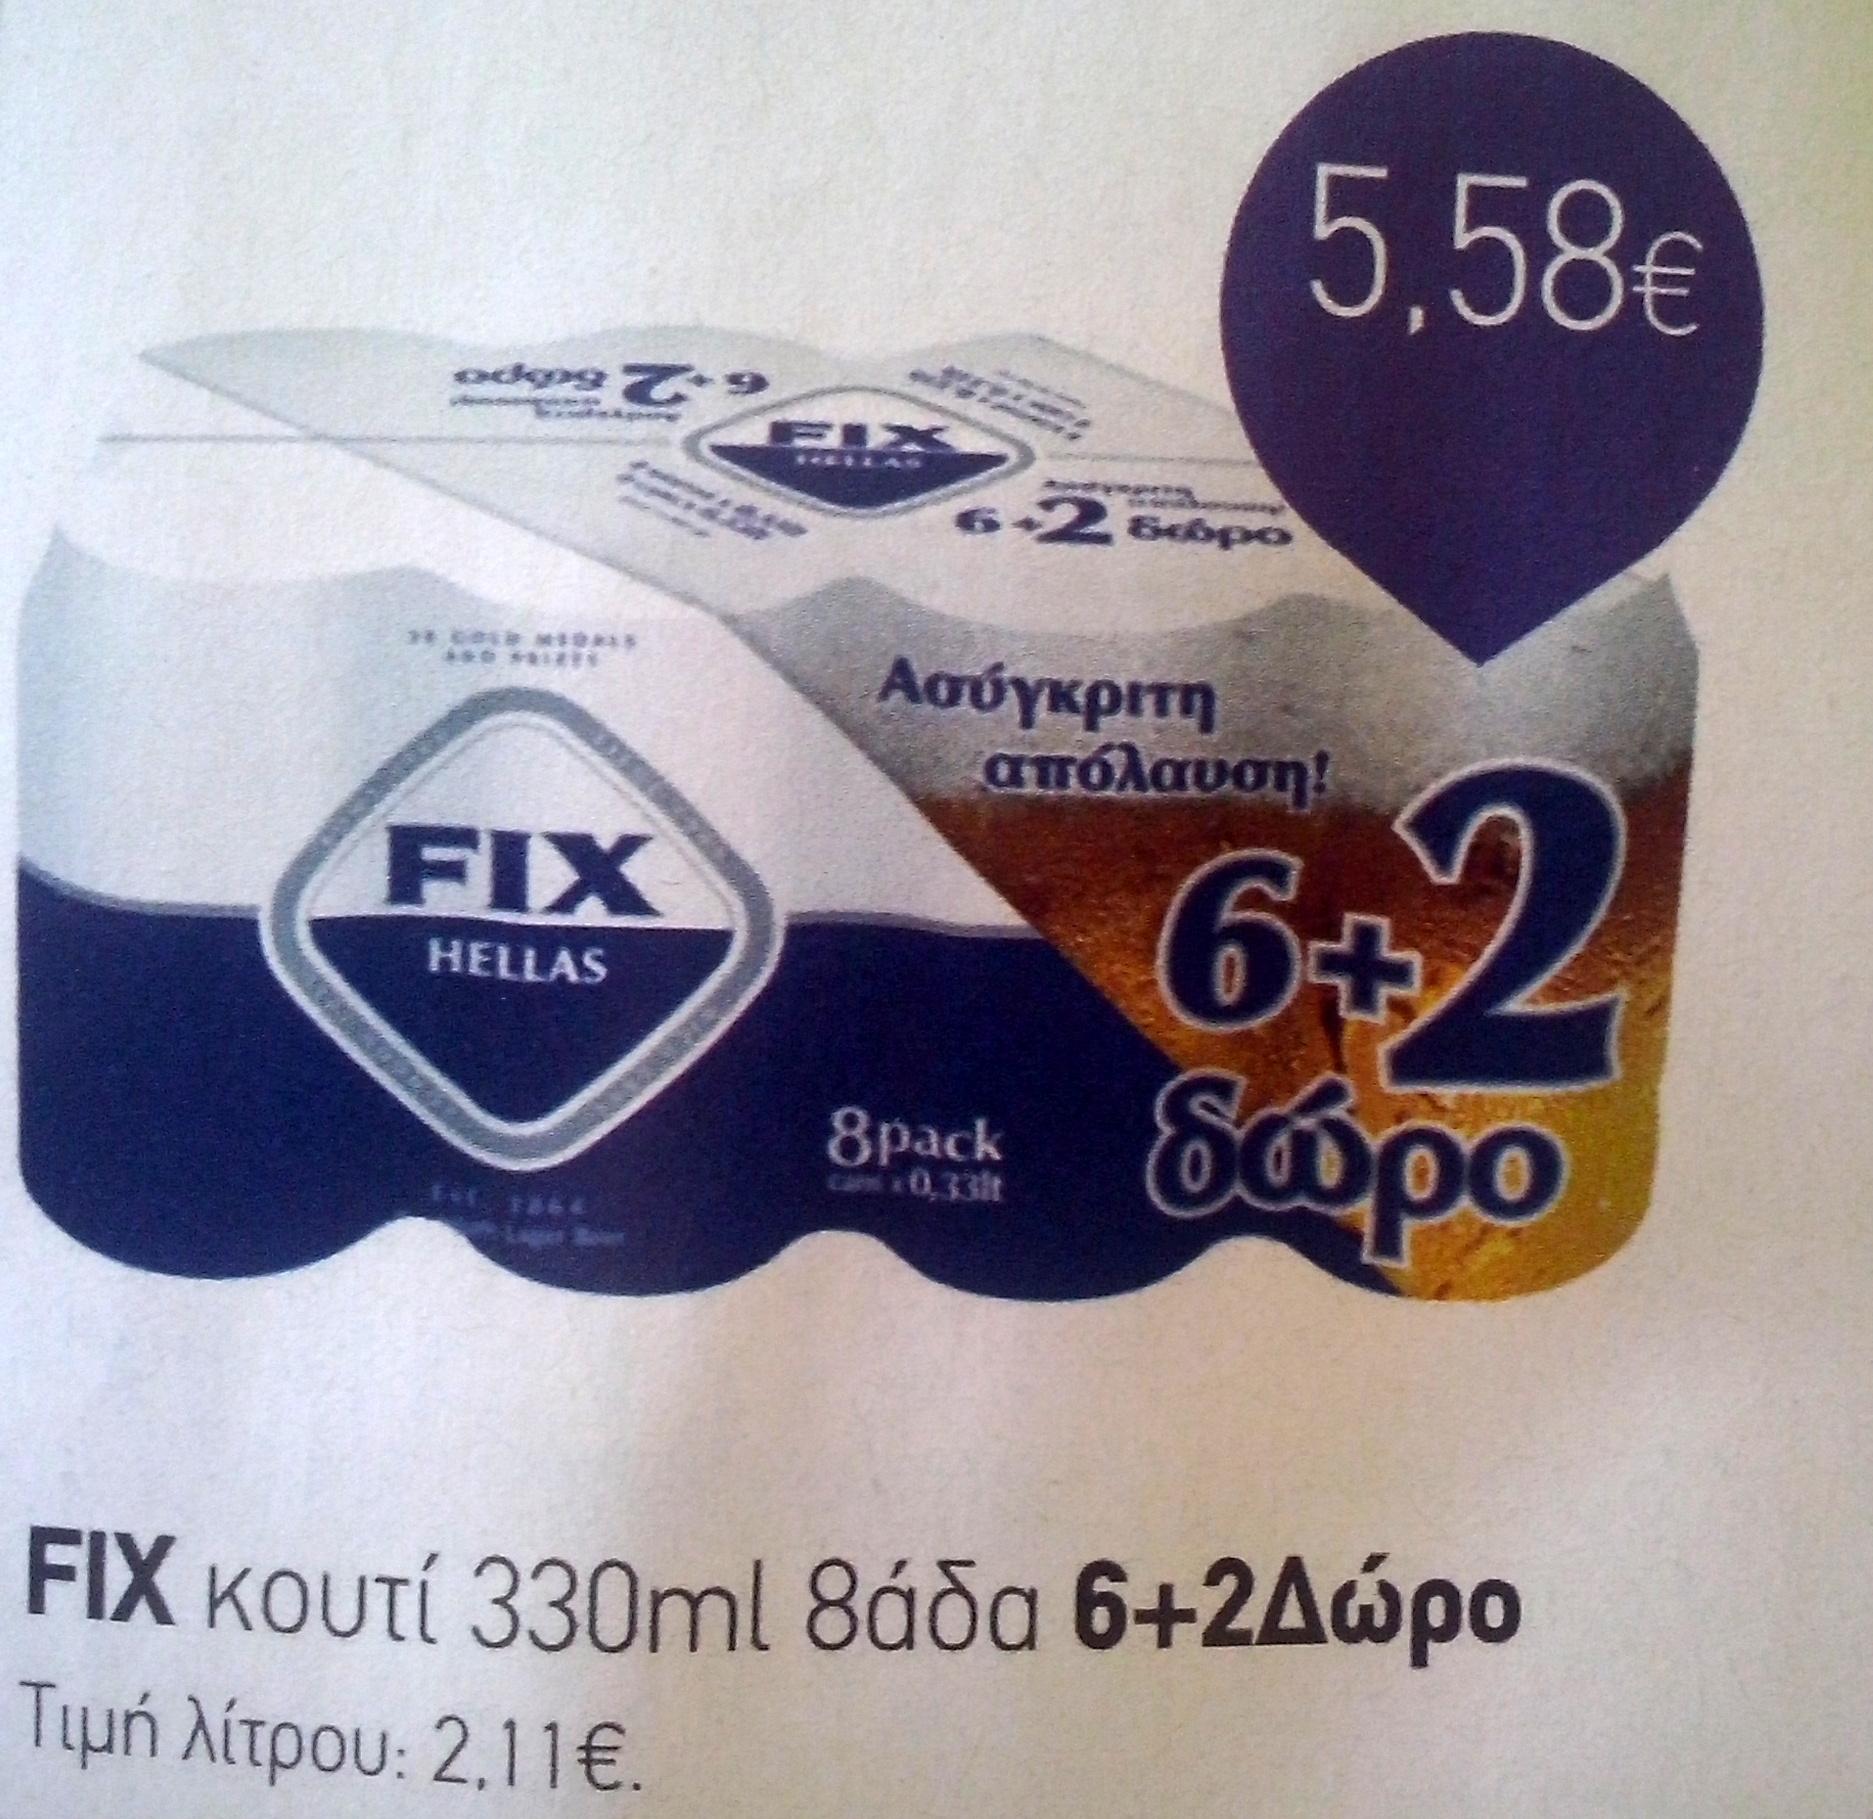 INKA offer Fix 6_2